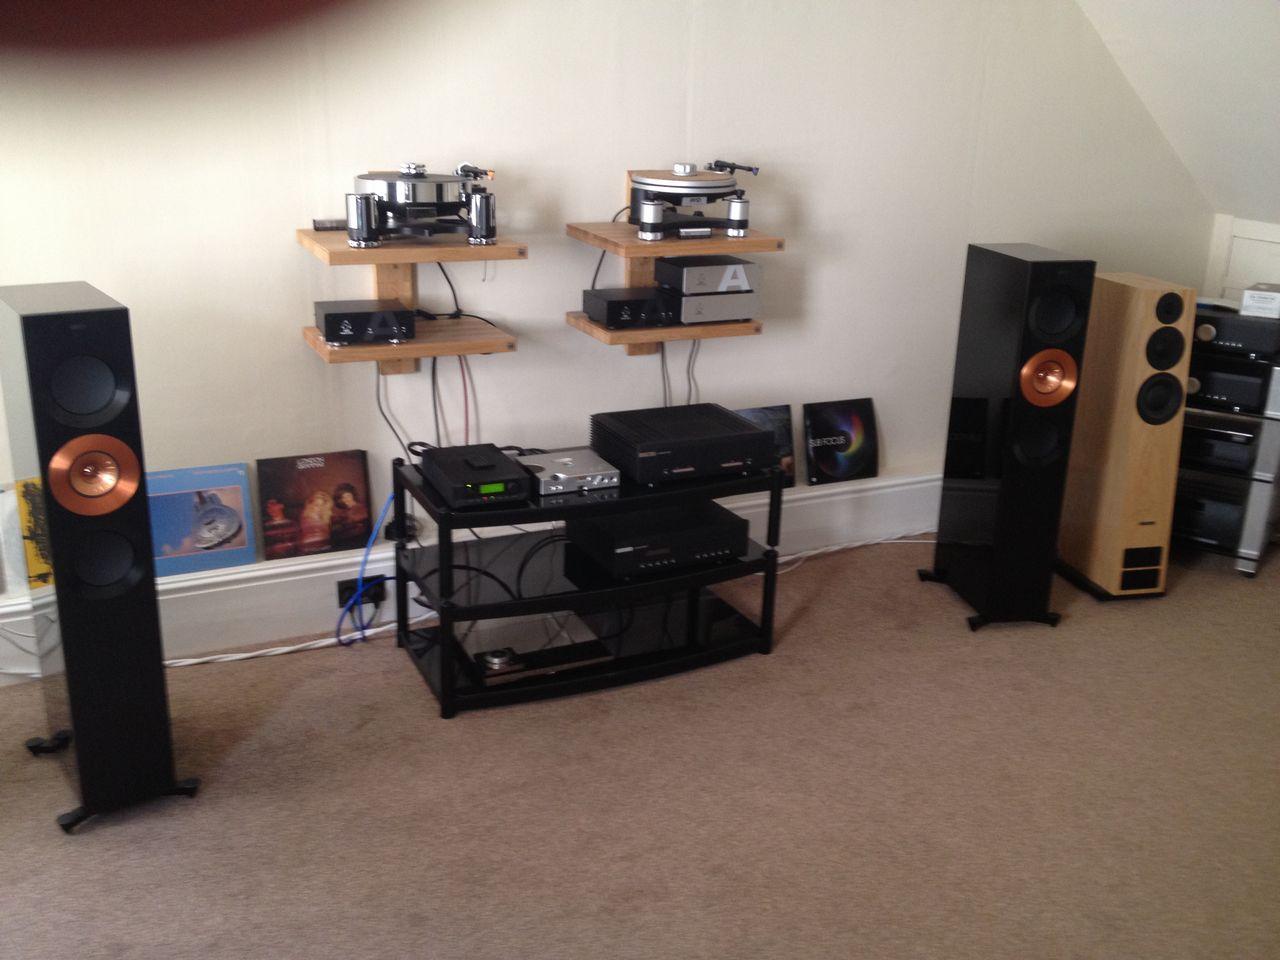 Proper hi-fi speaker recommendations for under £4k (new or used